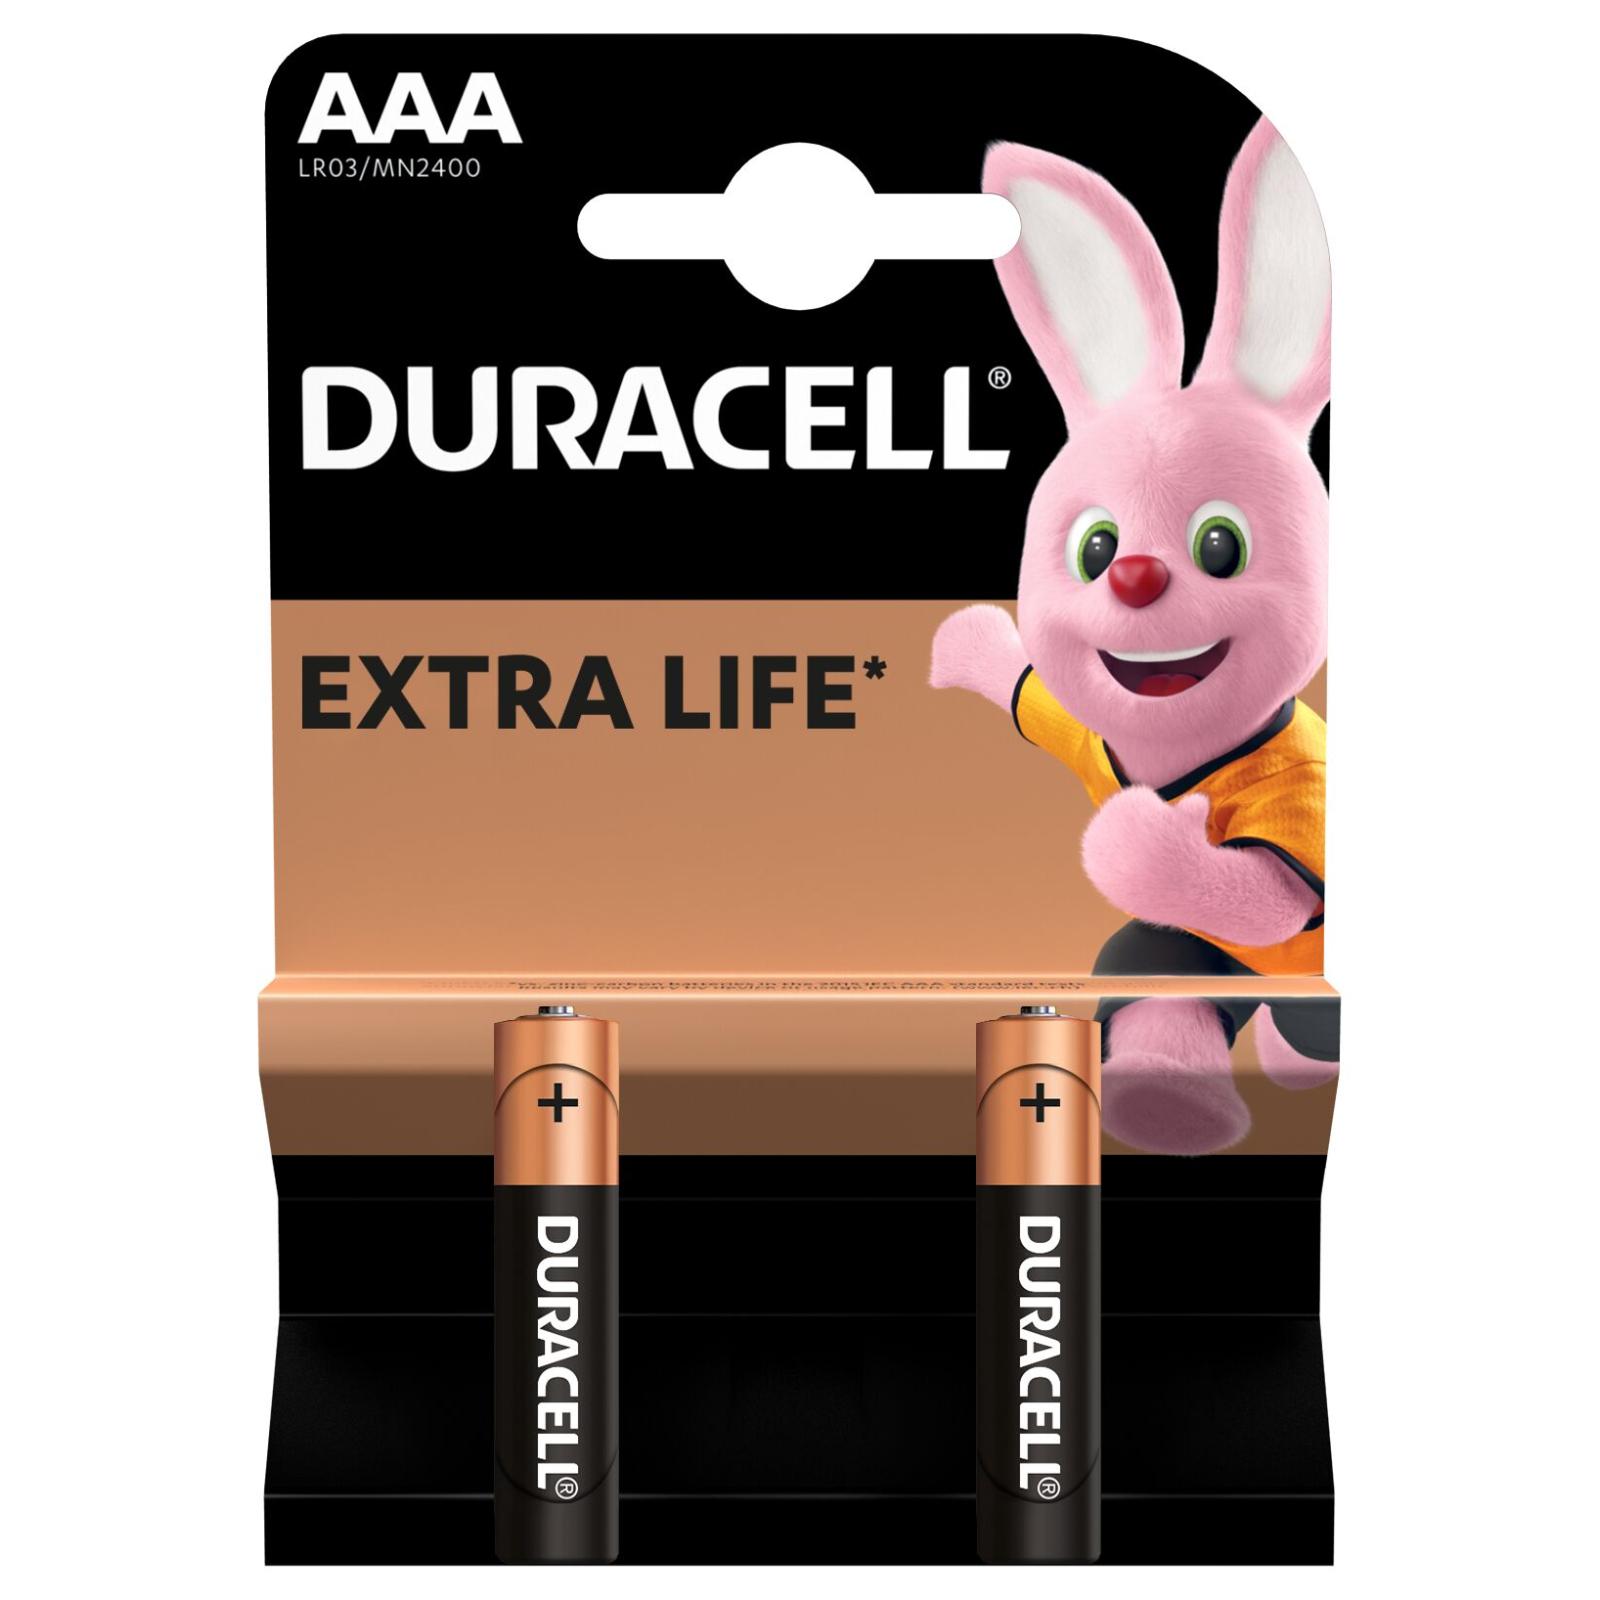 Батарейка Duracell AAA MN2400 LR03 * 2 (5000394058170 / 81484984) изображение 2